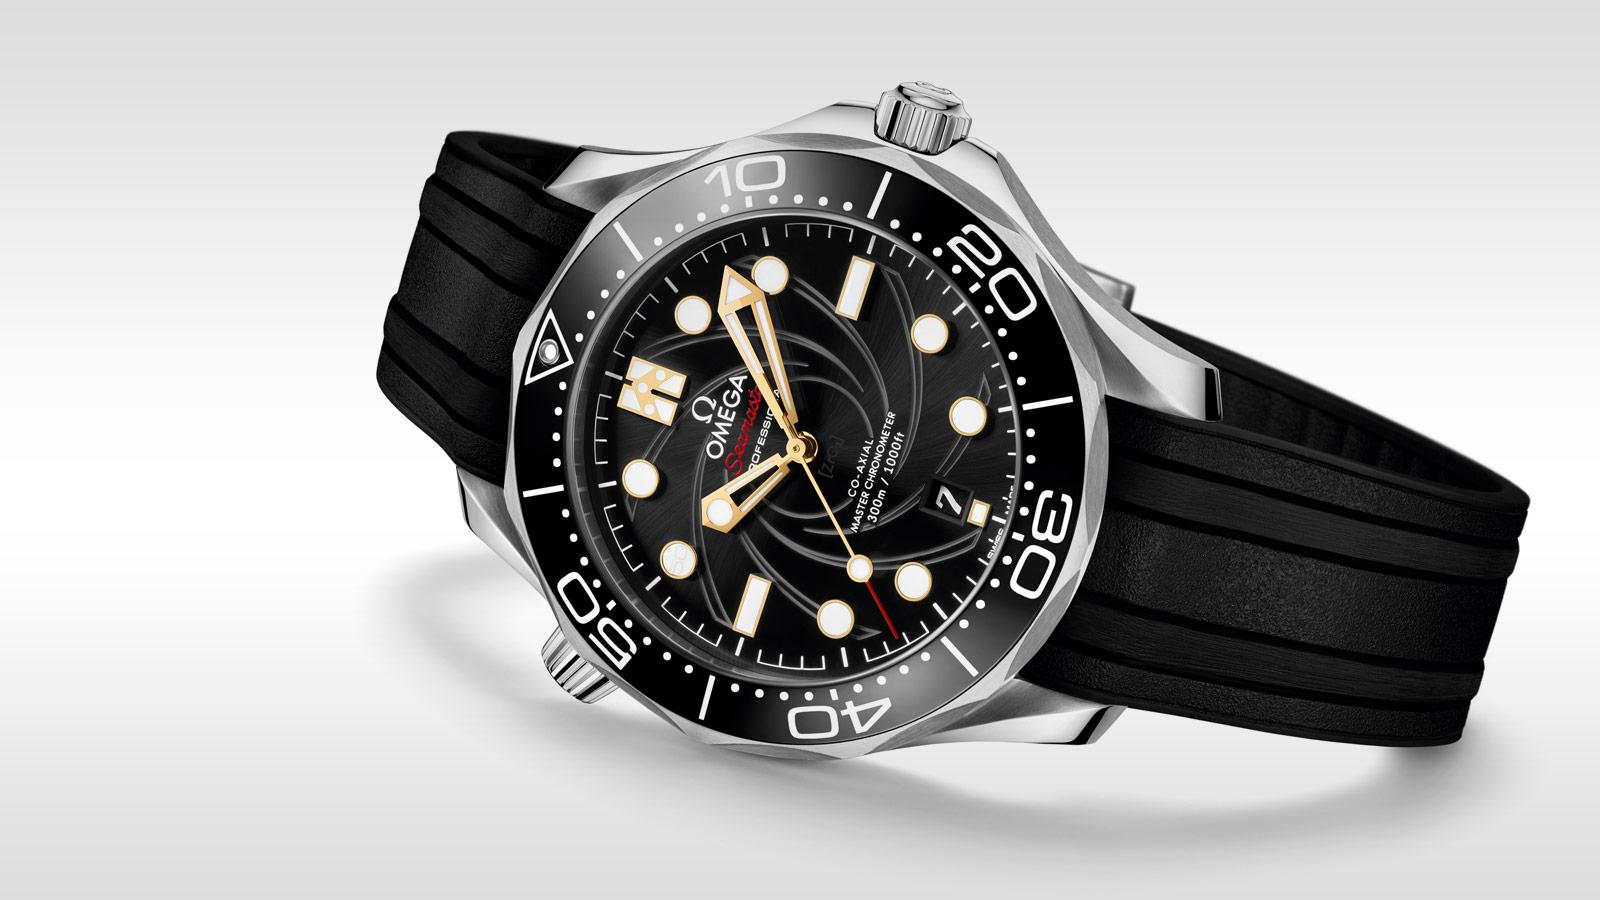 Seamaster 300米潜水表 300米潜水表 欧米茄至臻天文台表42毫米 - 210.22.42.20.01.004 - 查看 7